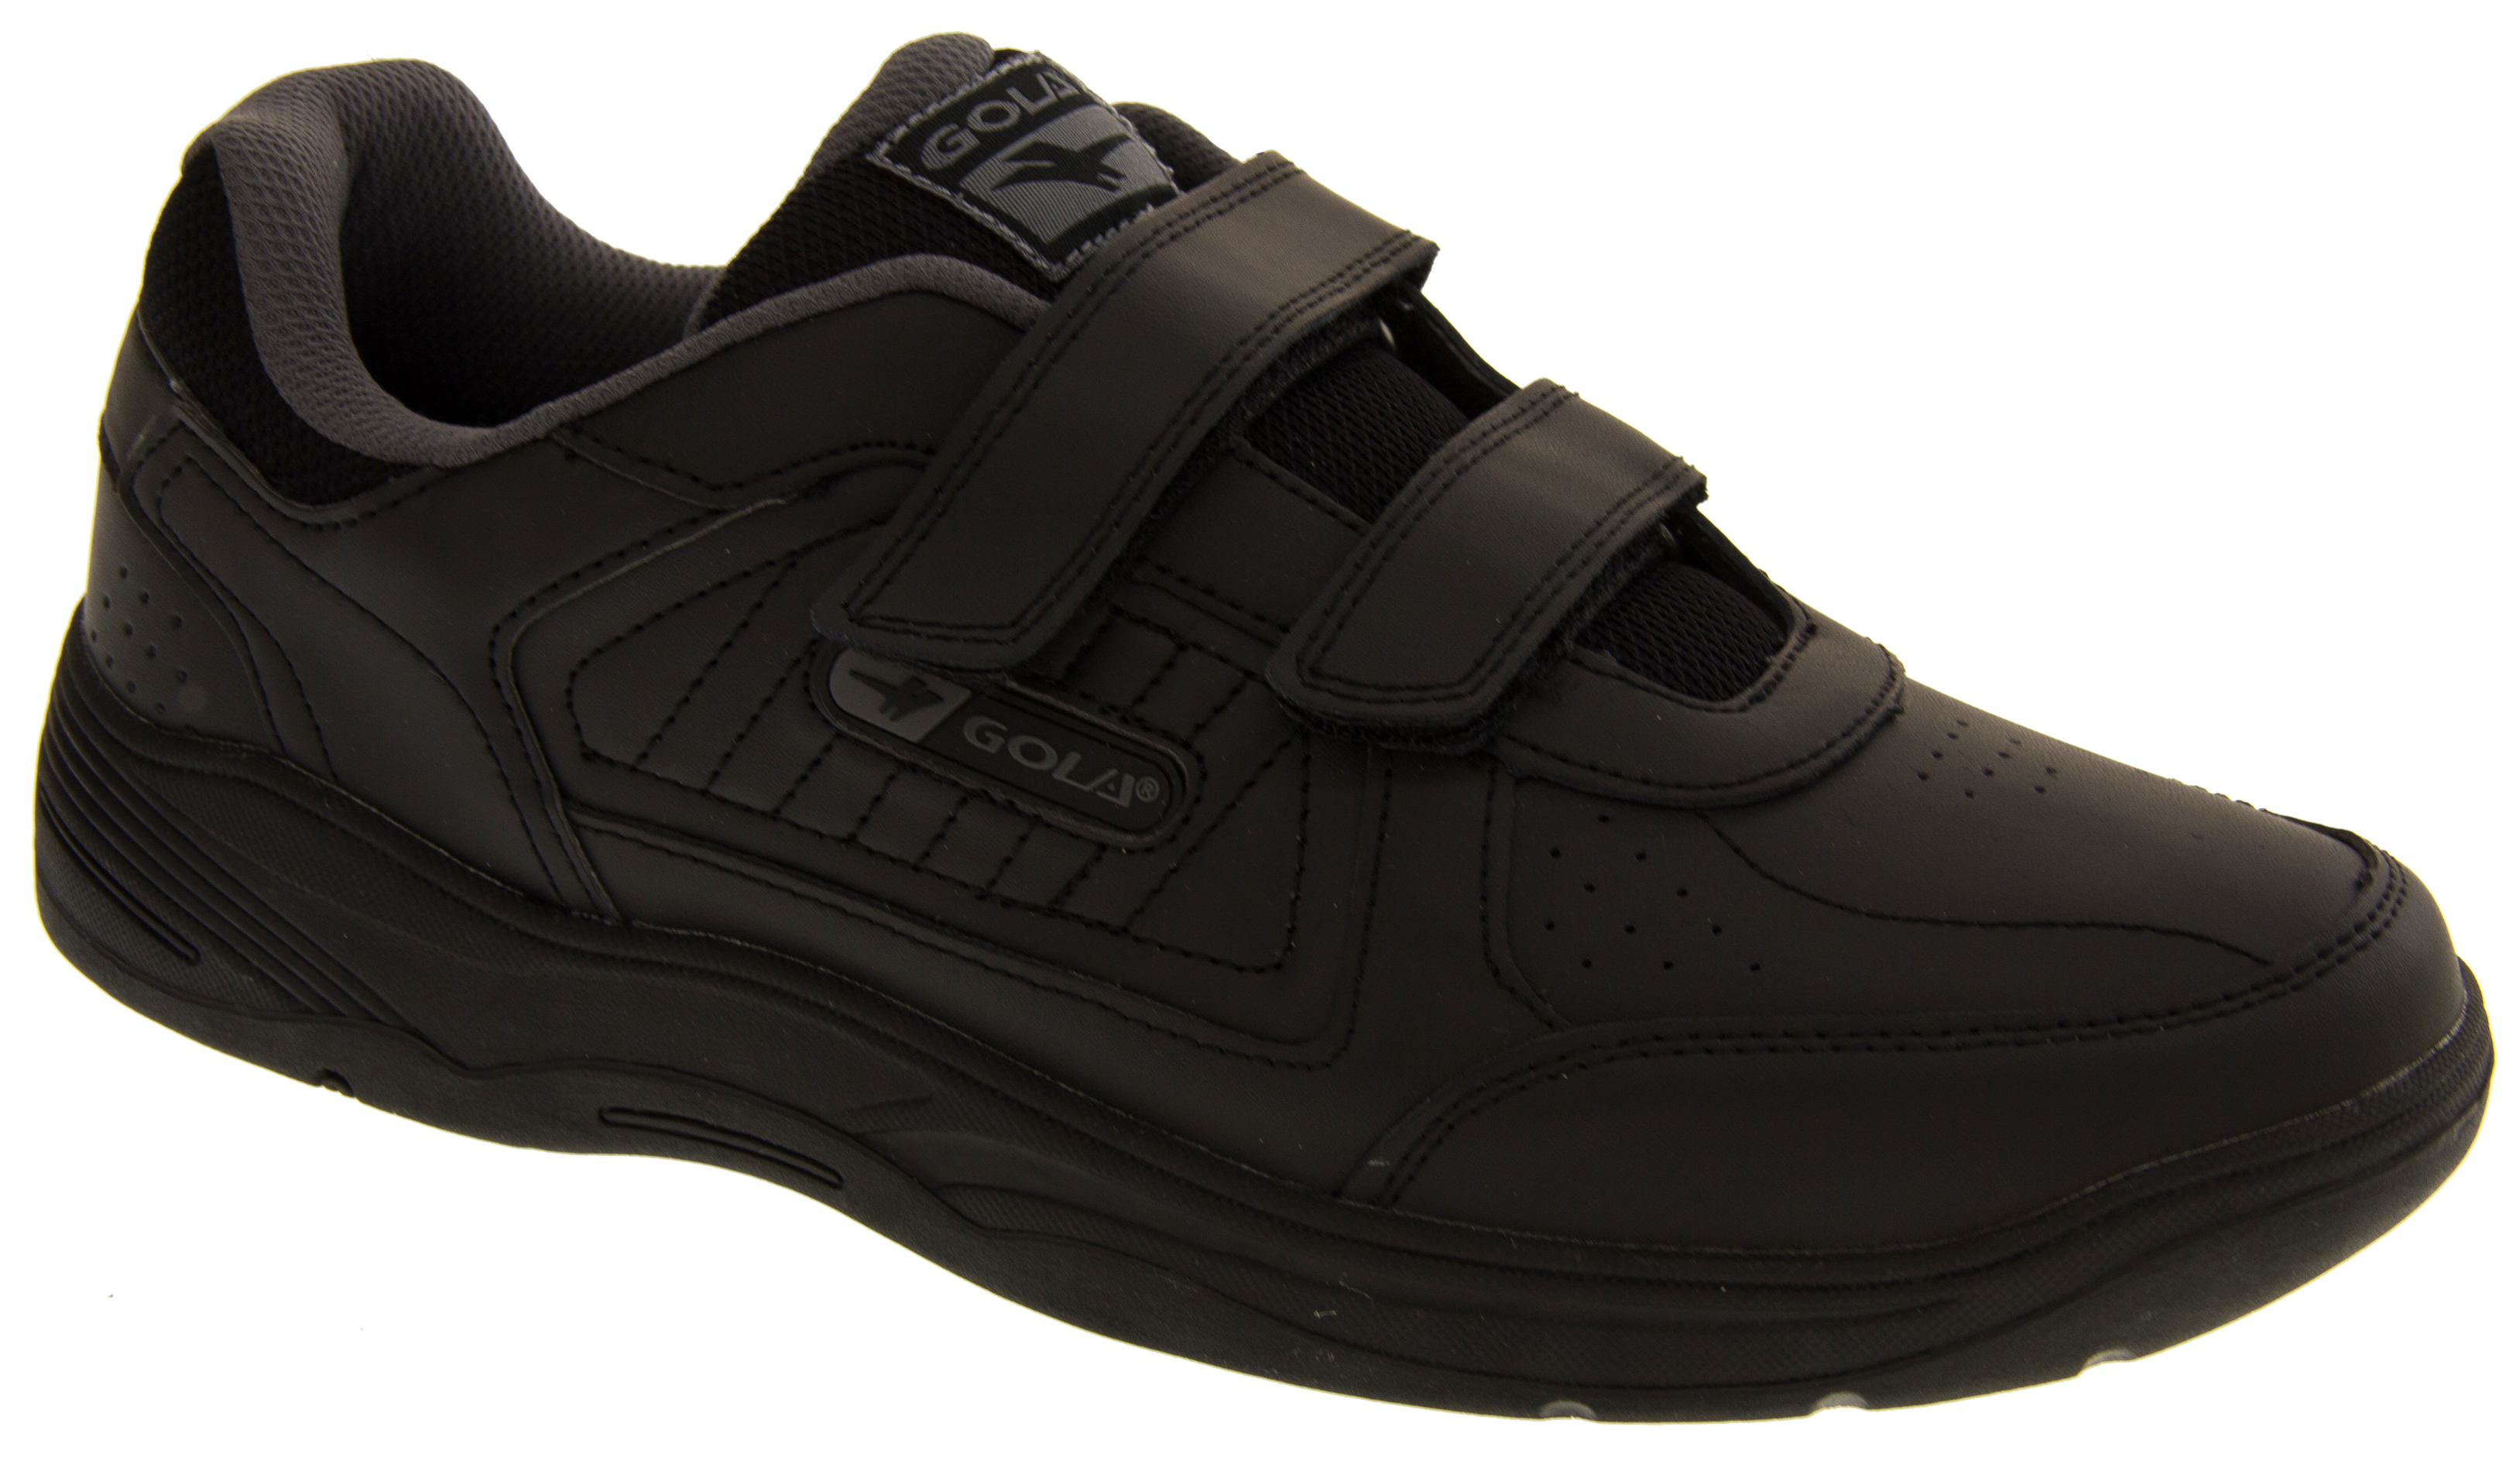 Gola Herren Belmont Echtes Leder Klettverschluss Weit Sitzende Schuhe Turnschuhe